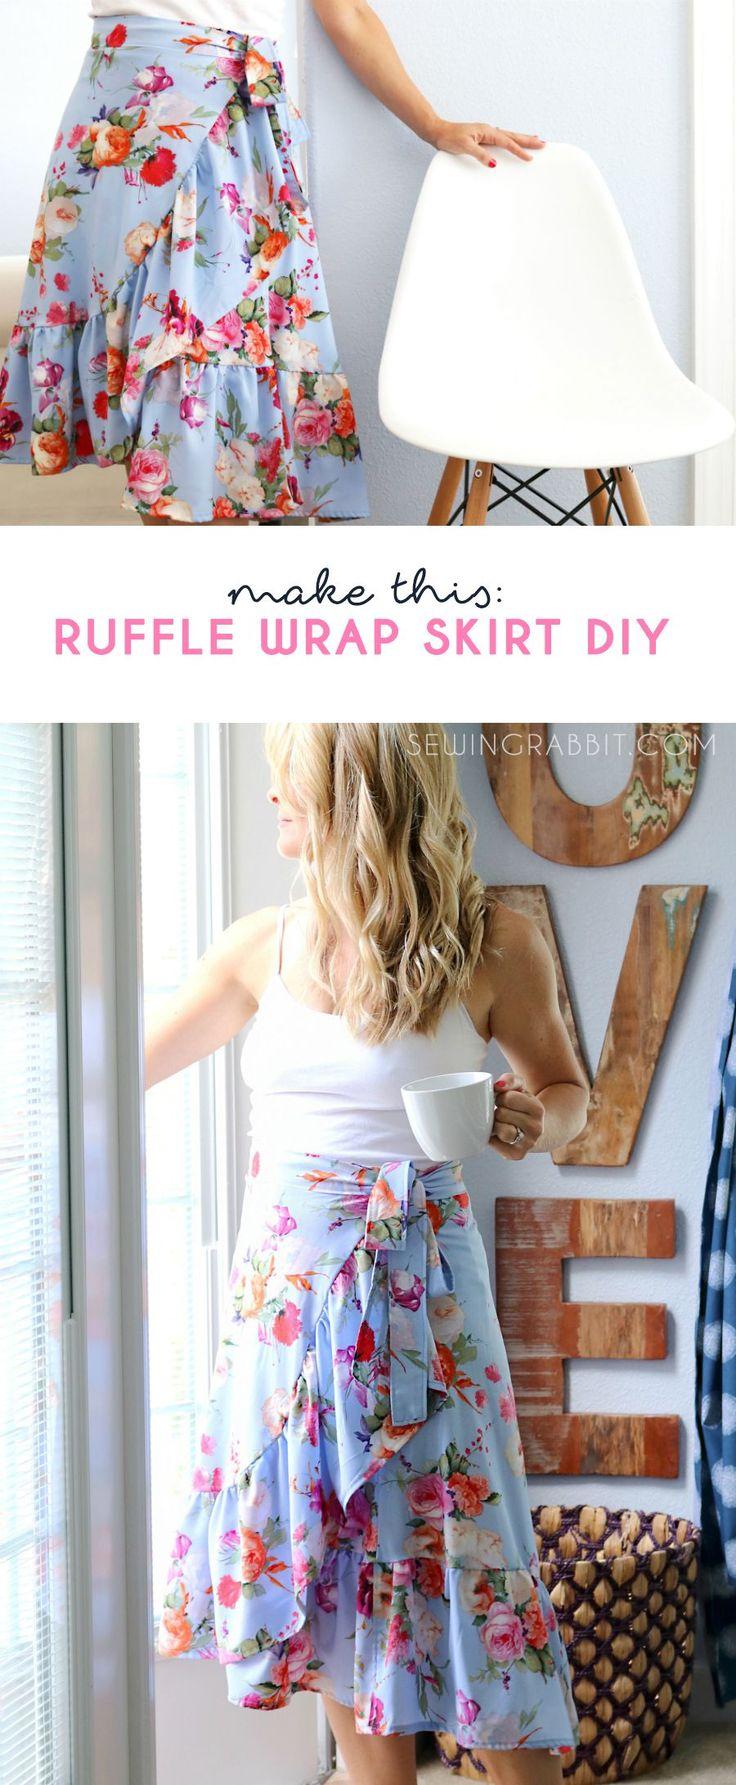 Sew a breezy bohemian style skirt, the ruffle wrap skirt!